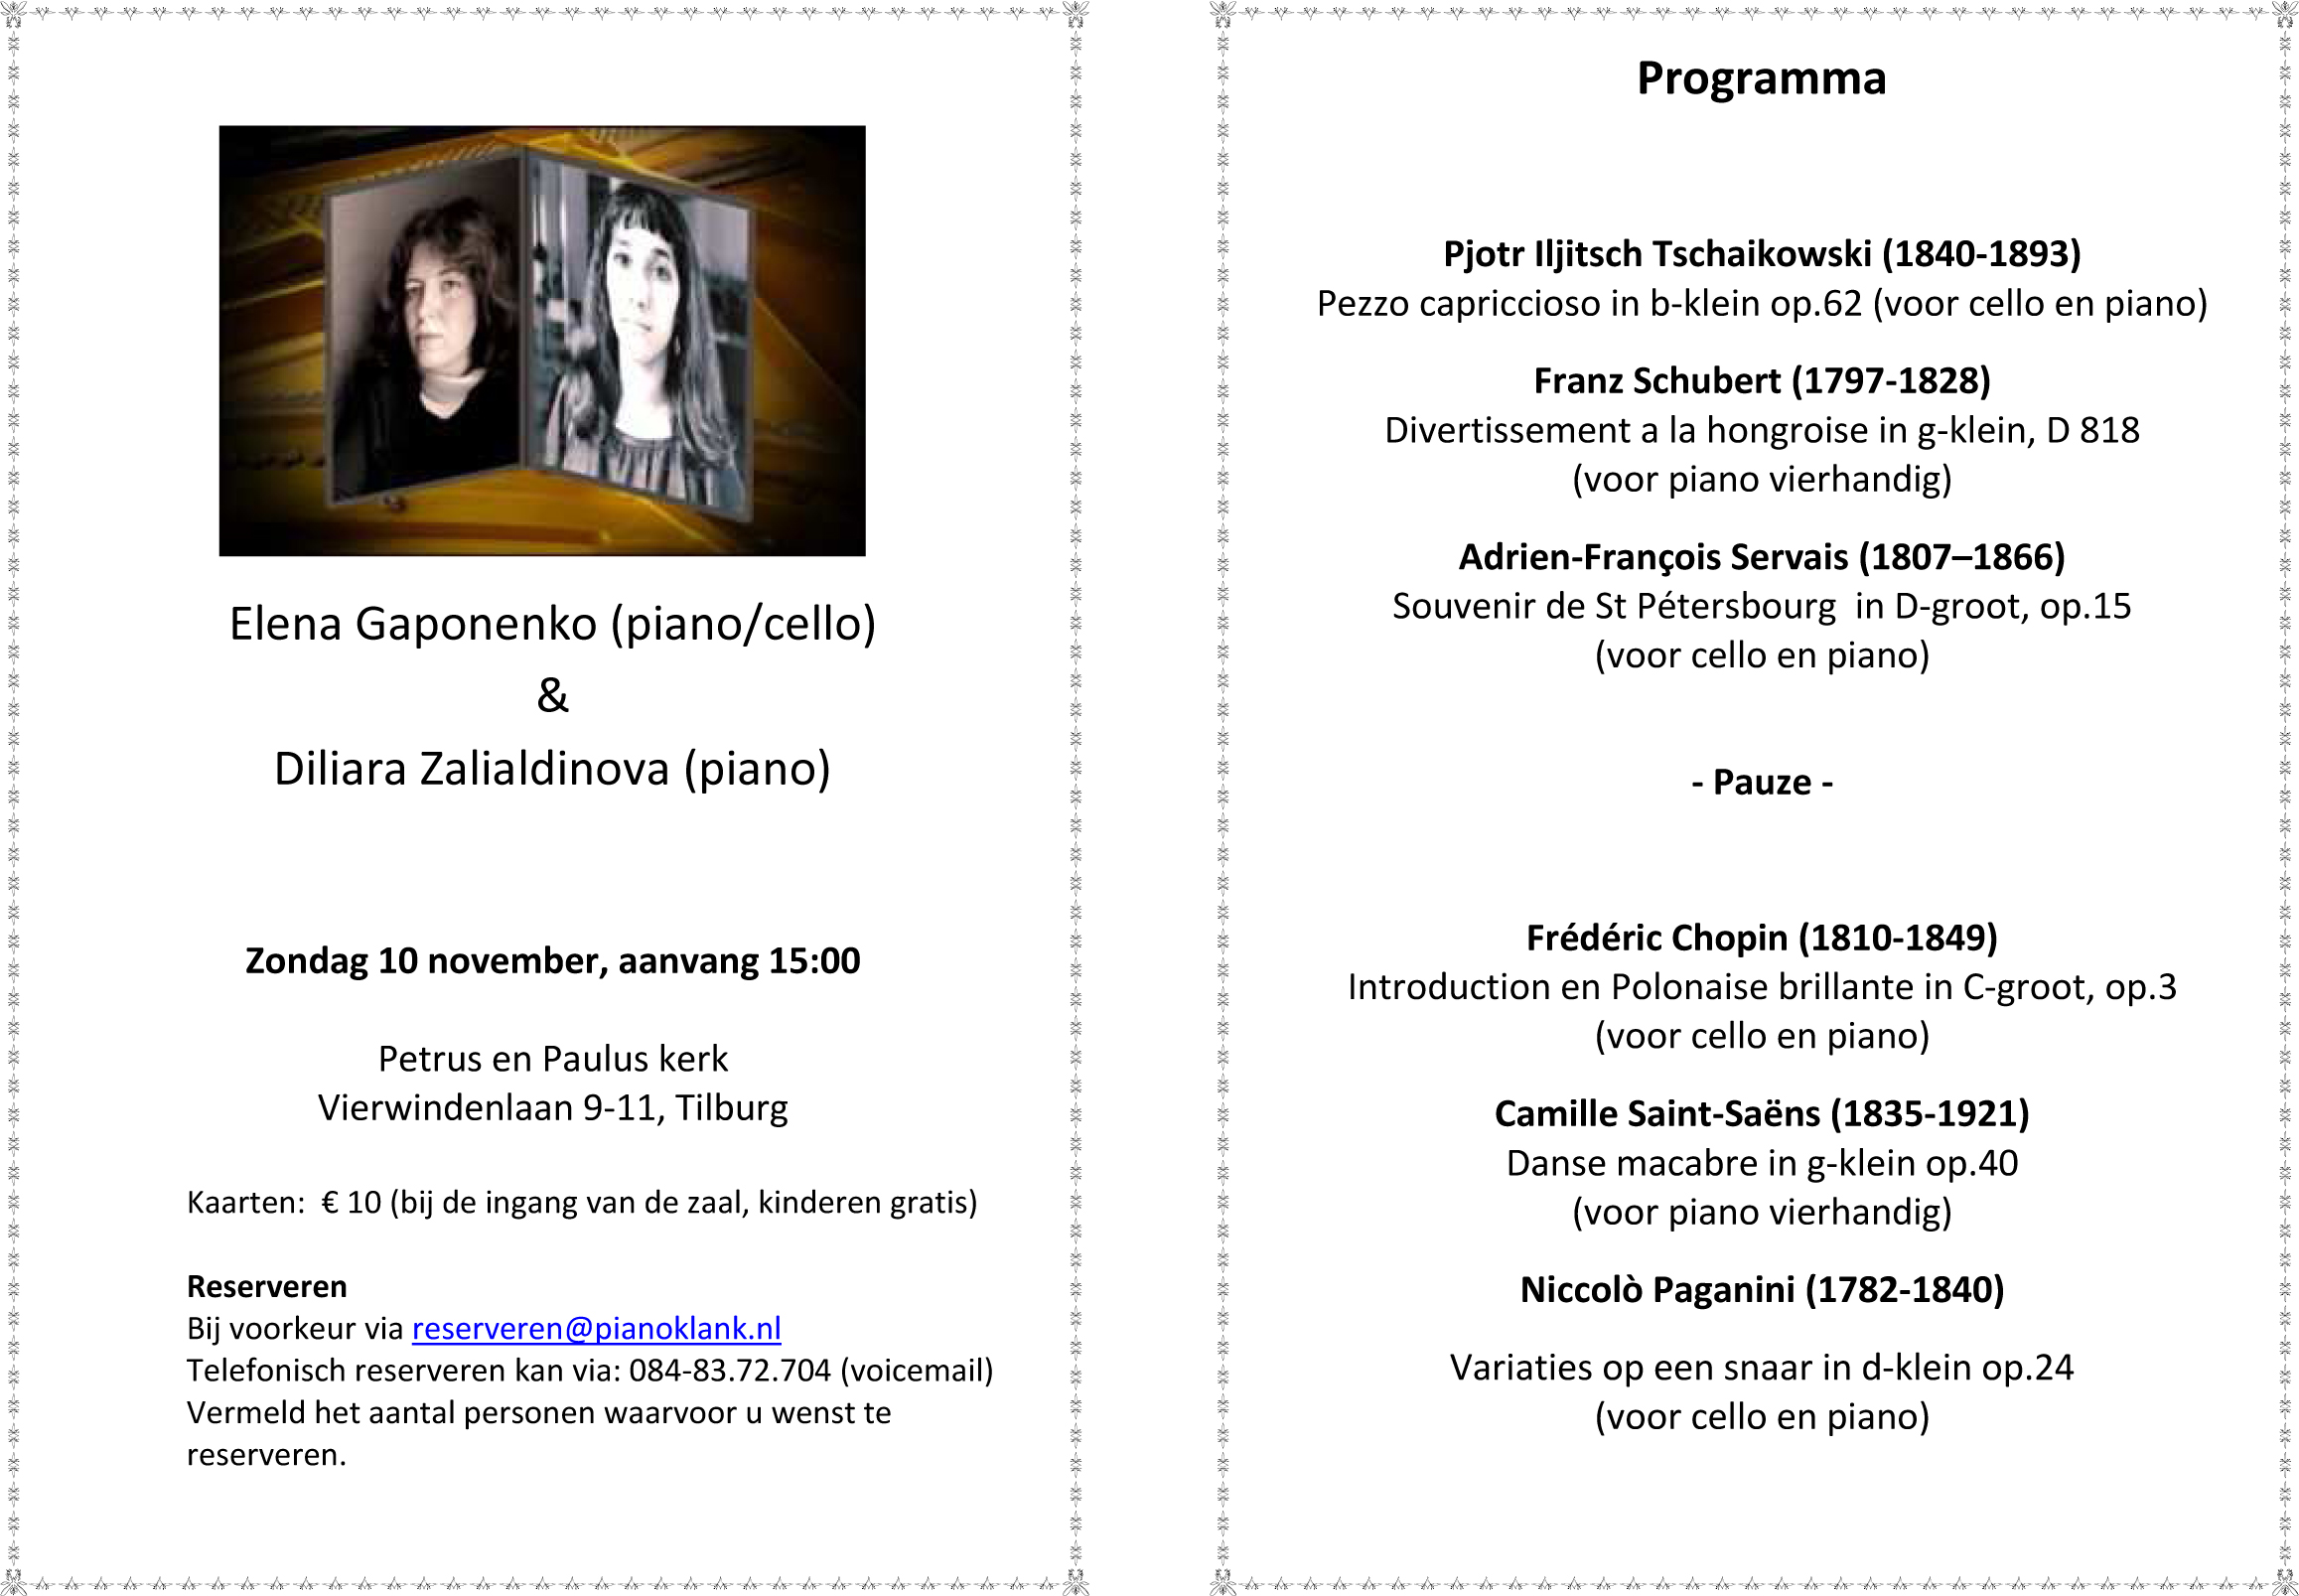 11-10-2013_Programma_digitaal_1-2